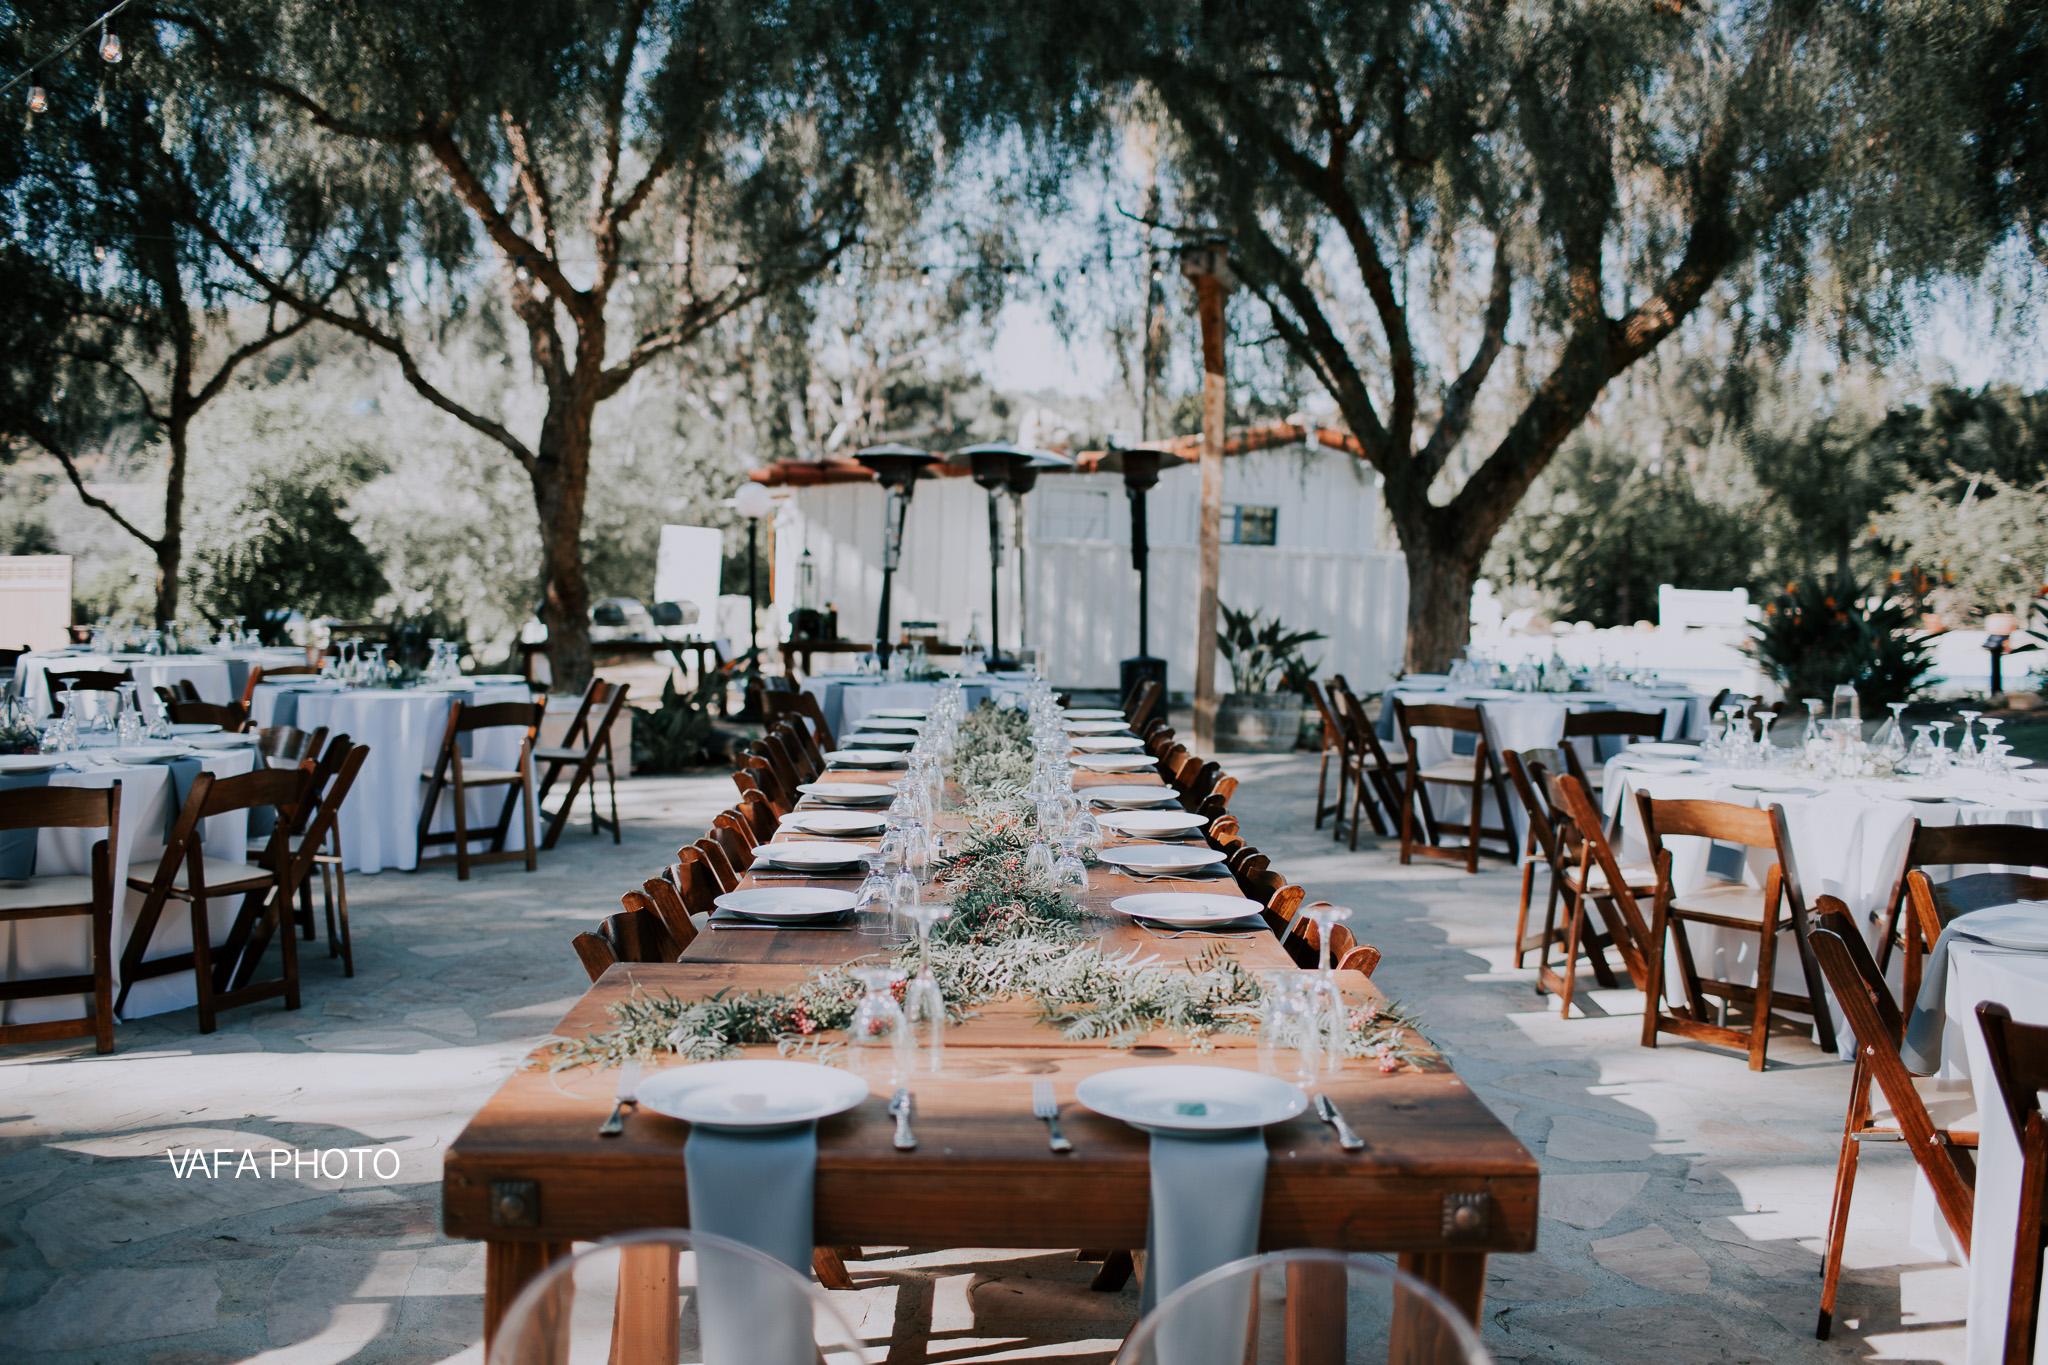 Leo-Carrillo-Ranch-Wedding-Lauren-Mike-Vafa-Photo-428.jpg